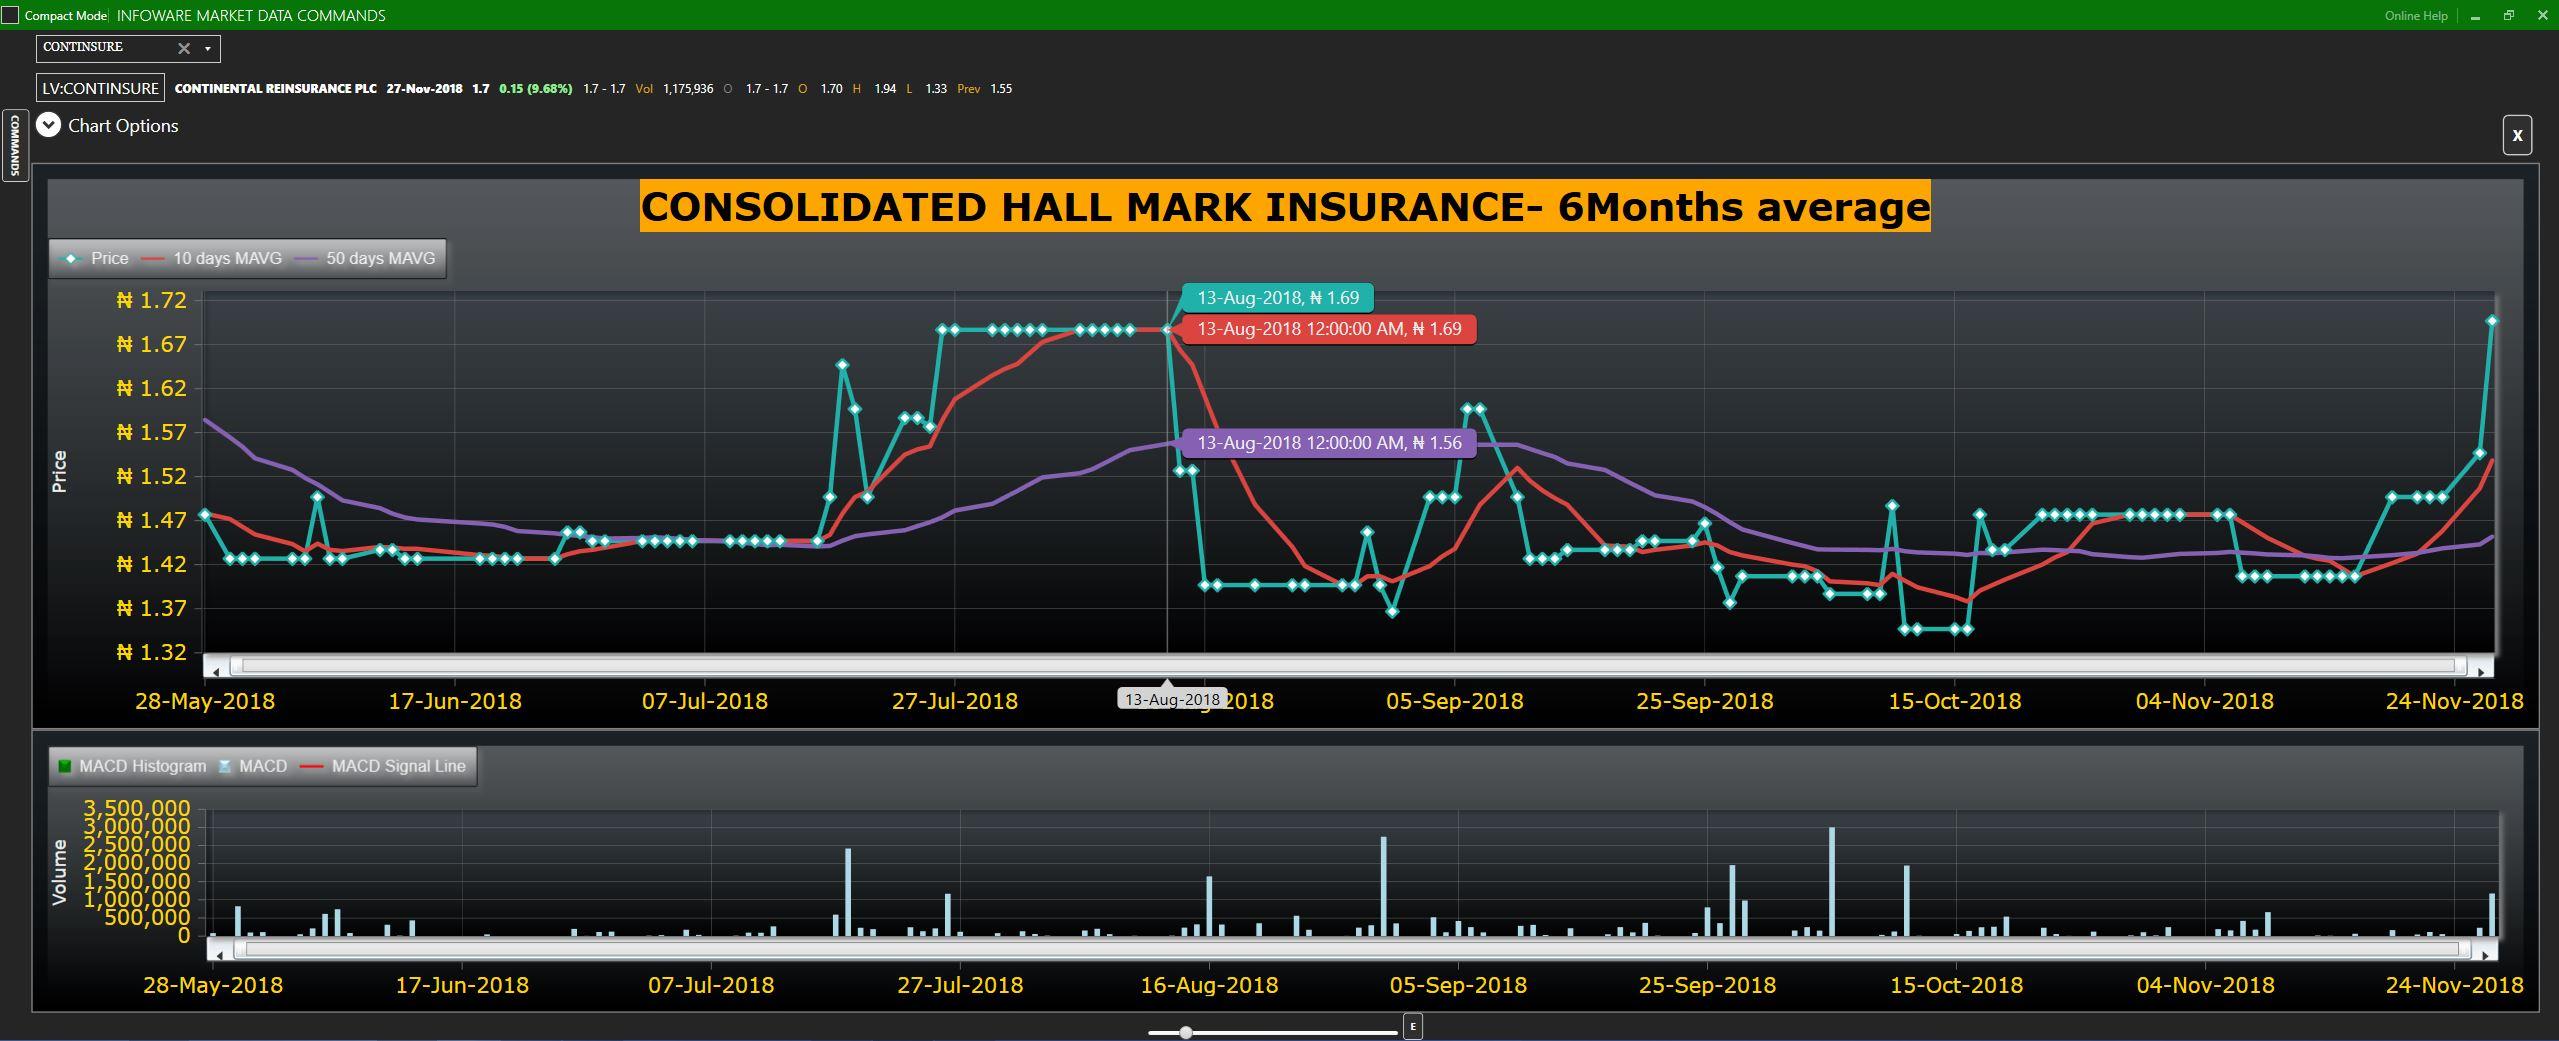 Consolidated Hallmark IMDT